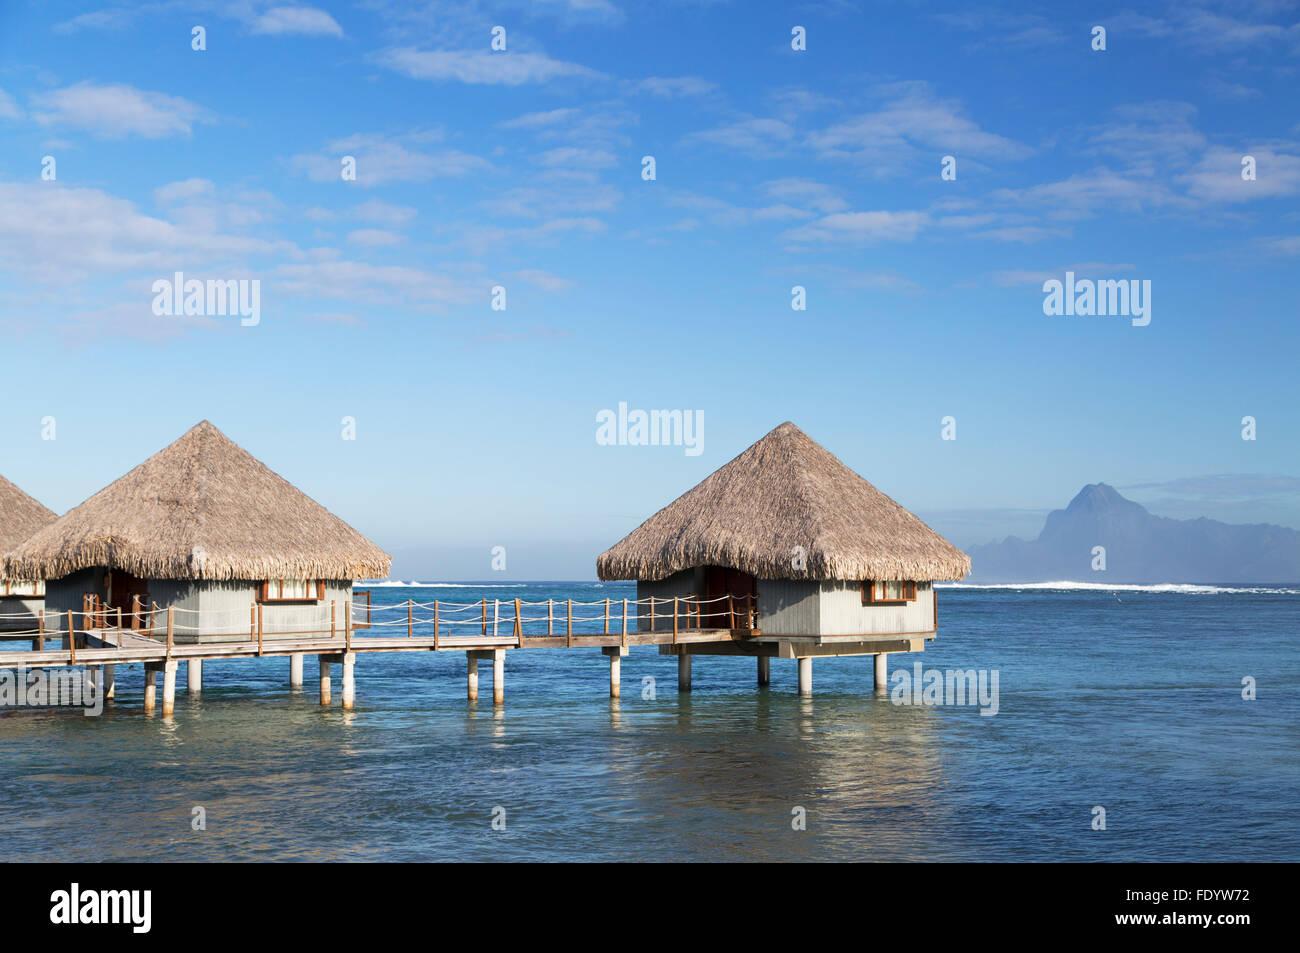 Overwater bungalows at Le Meridien Tahiti Hotel, Pape'ete, Tahiti, French Polynesia - Stock Image